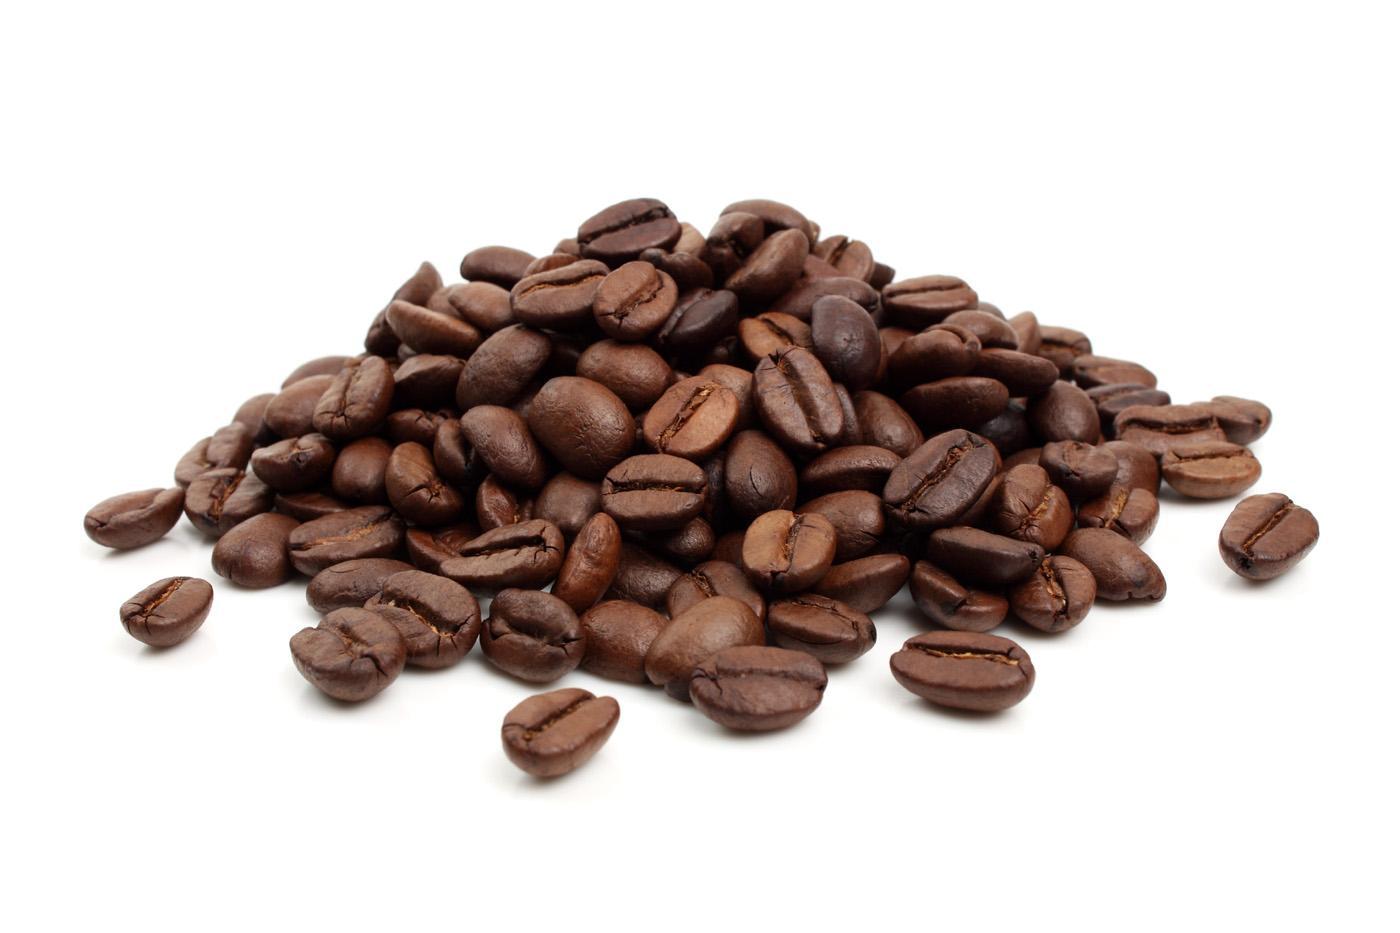 Grains clipart bean. Coffee beans png images